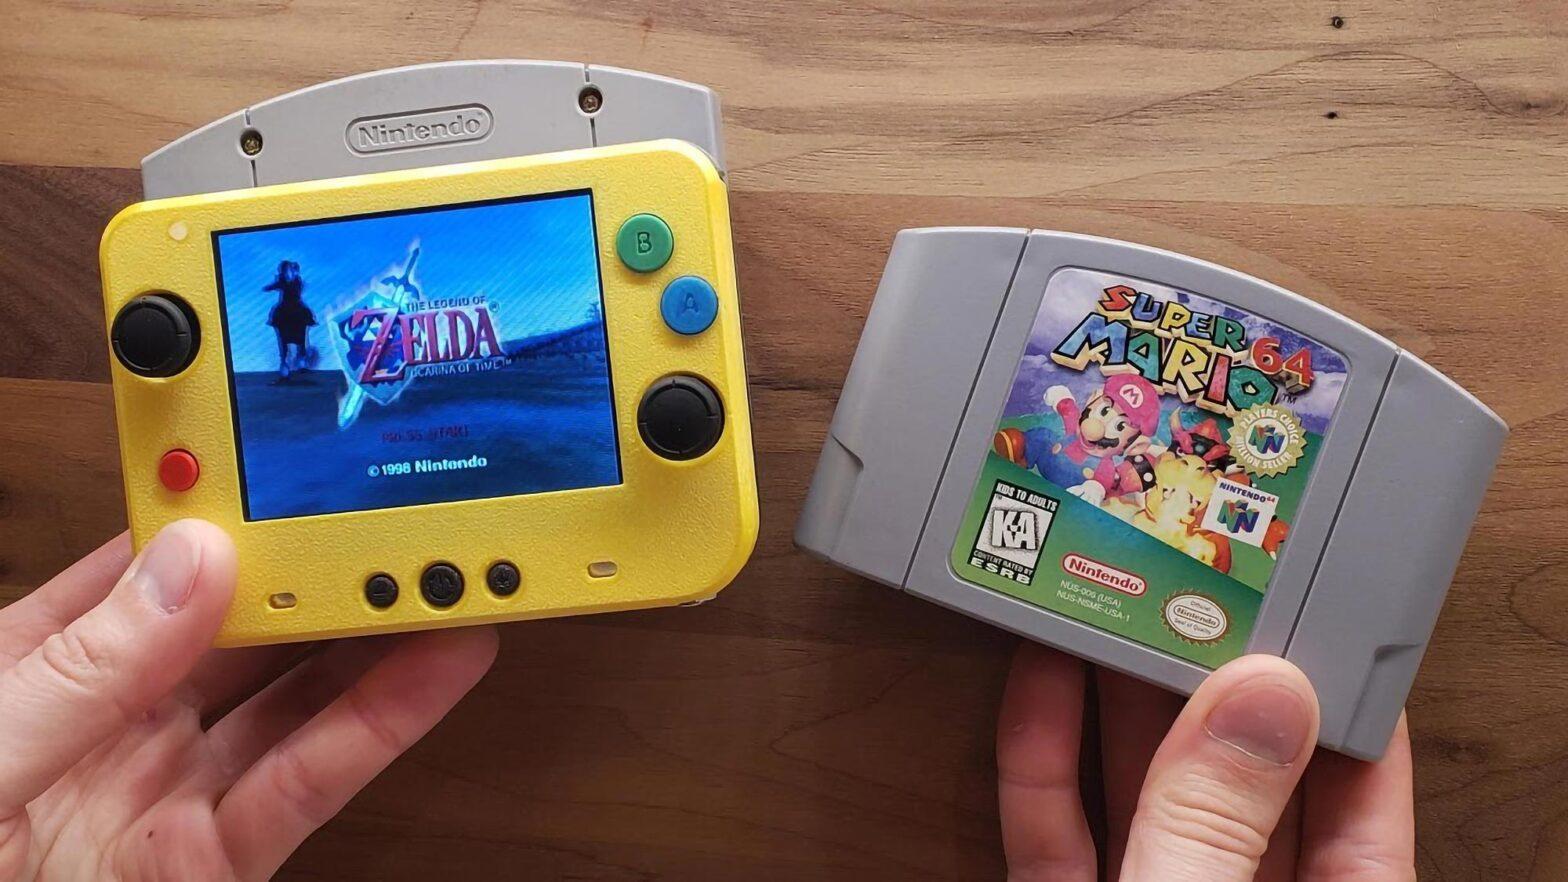 World's Smallest Nintendo 64 Portable by GmanModz